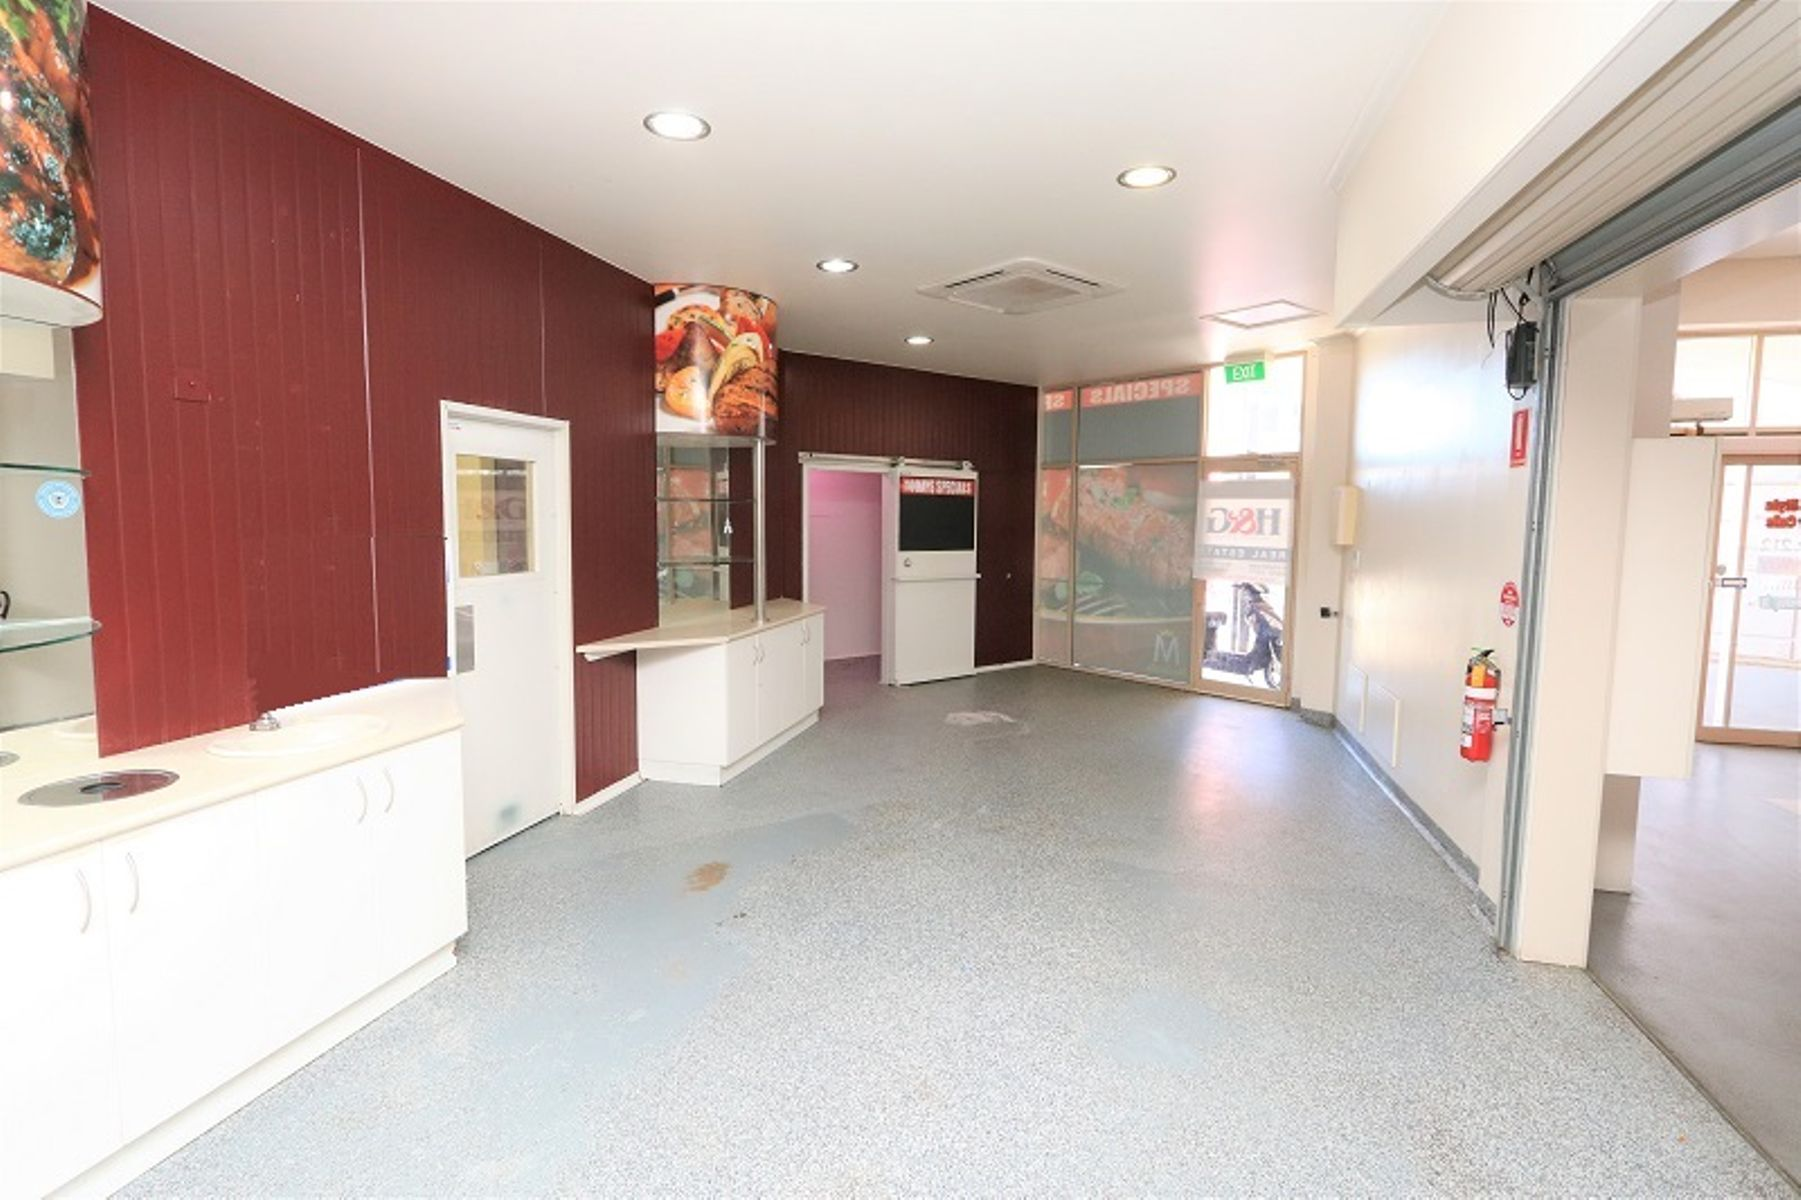 Shop 6, 177 Allan Street, Kyabram, VIC 3620